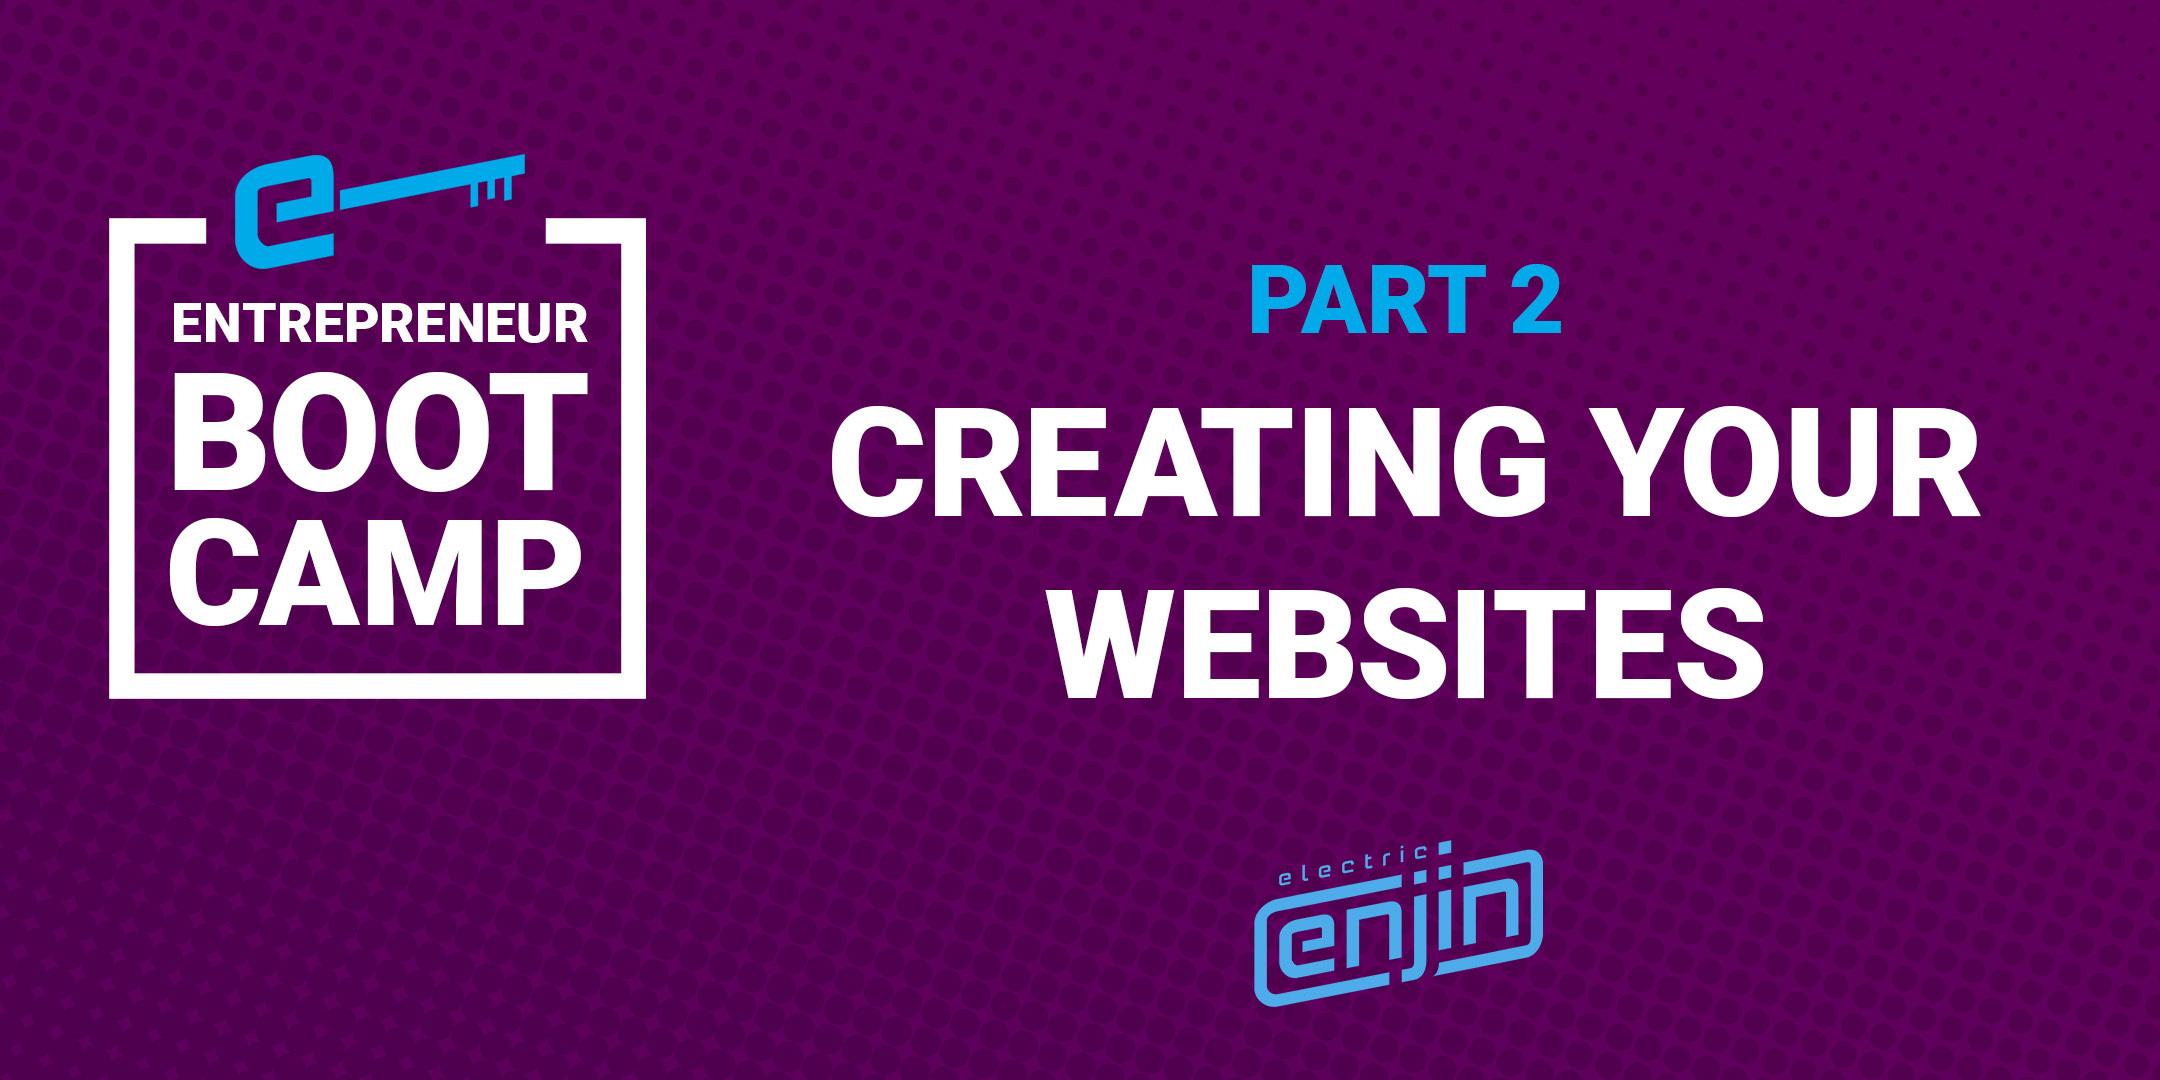 Entrepreneurs Boot Camp Recap: Session 2 - Creating Your Website